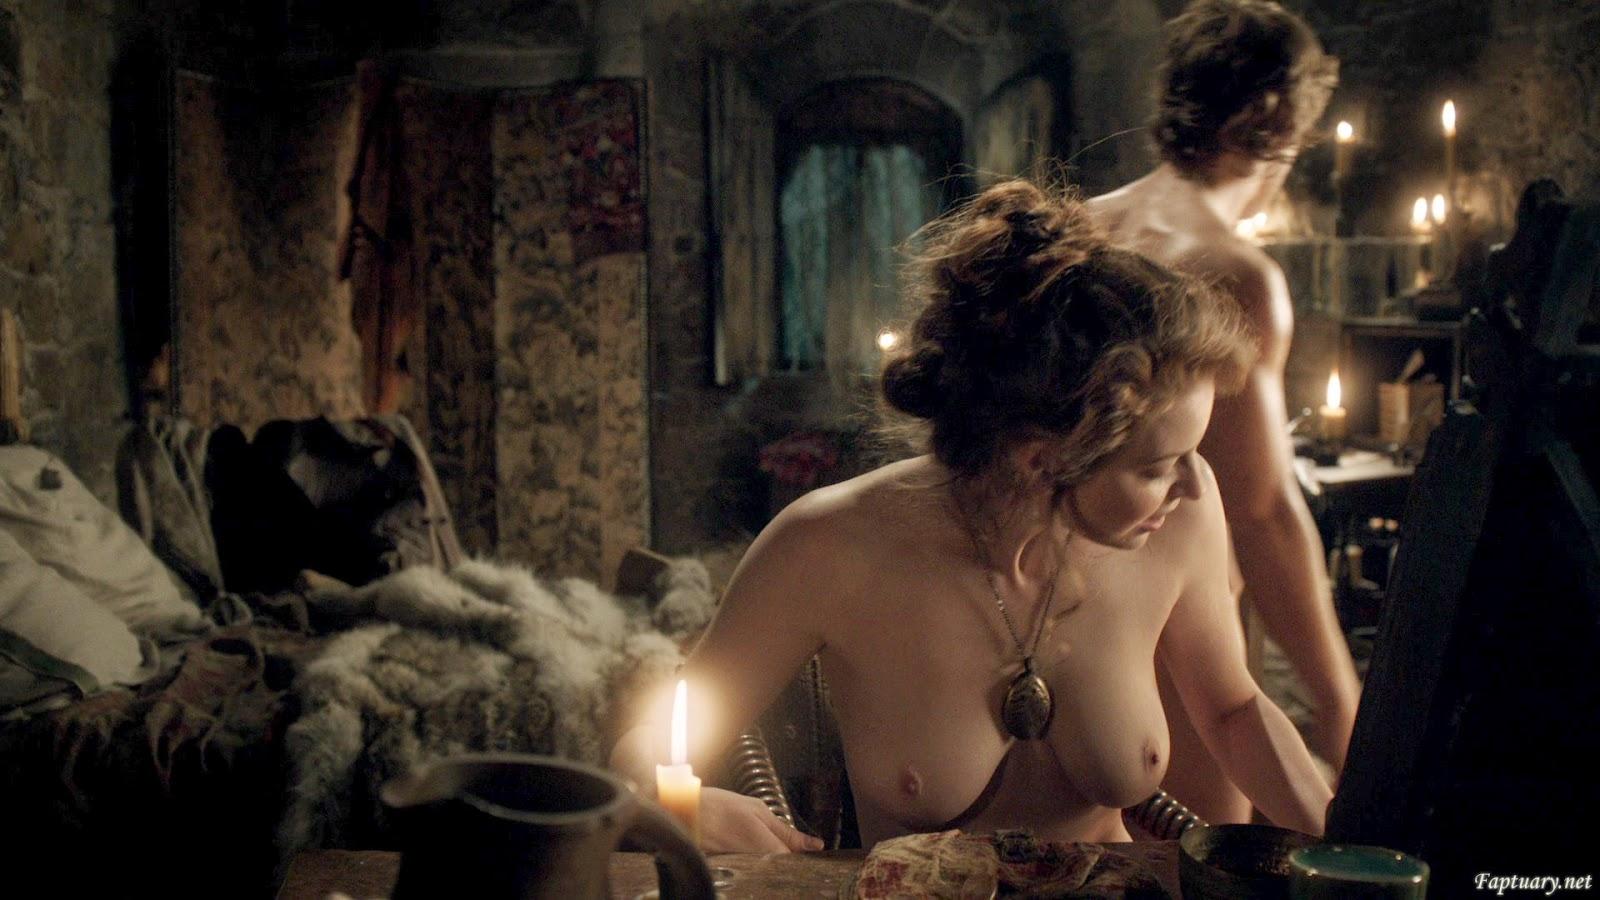 Esme Bianco Hot pertaining to les filles de game of thrones : amour, sexe, sang et pouvoirs